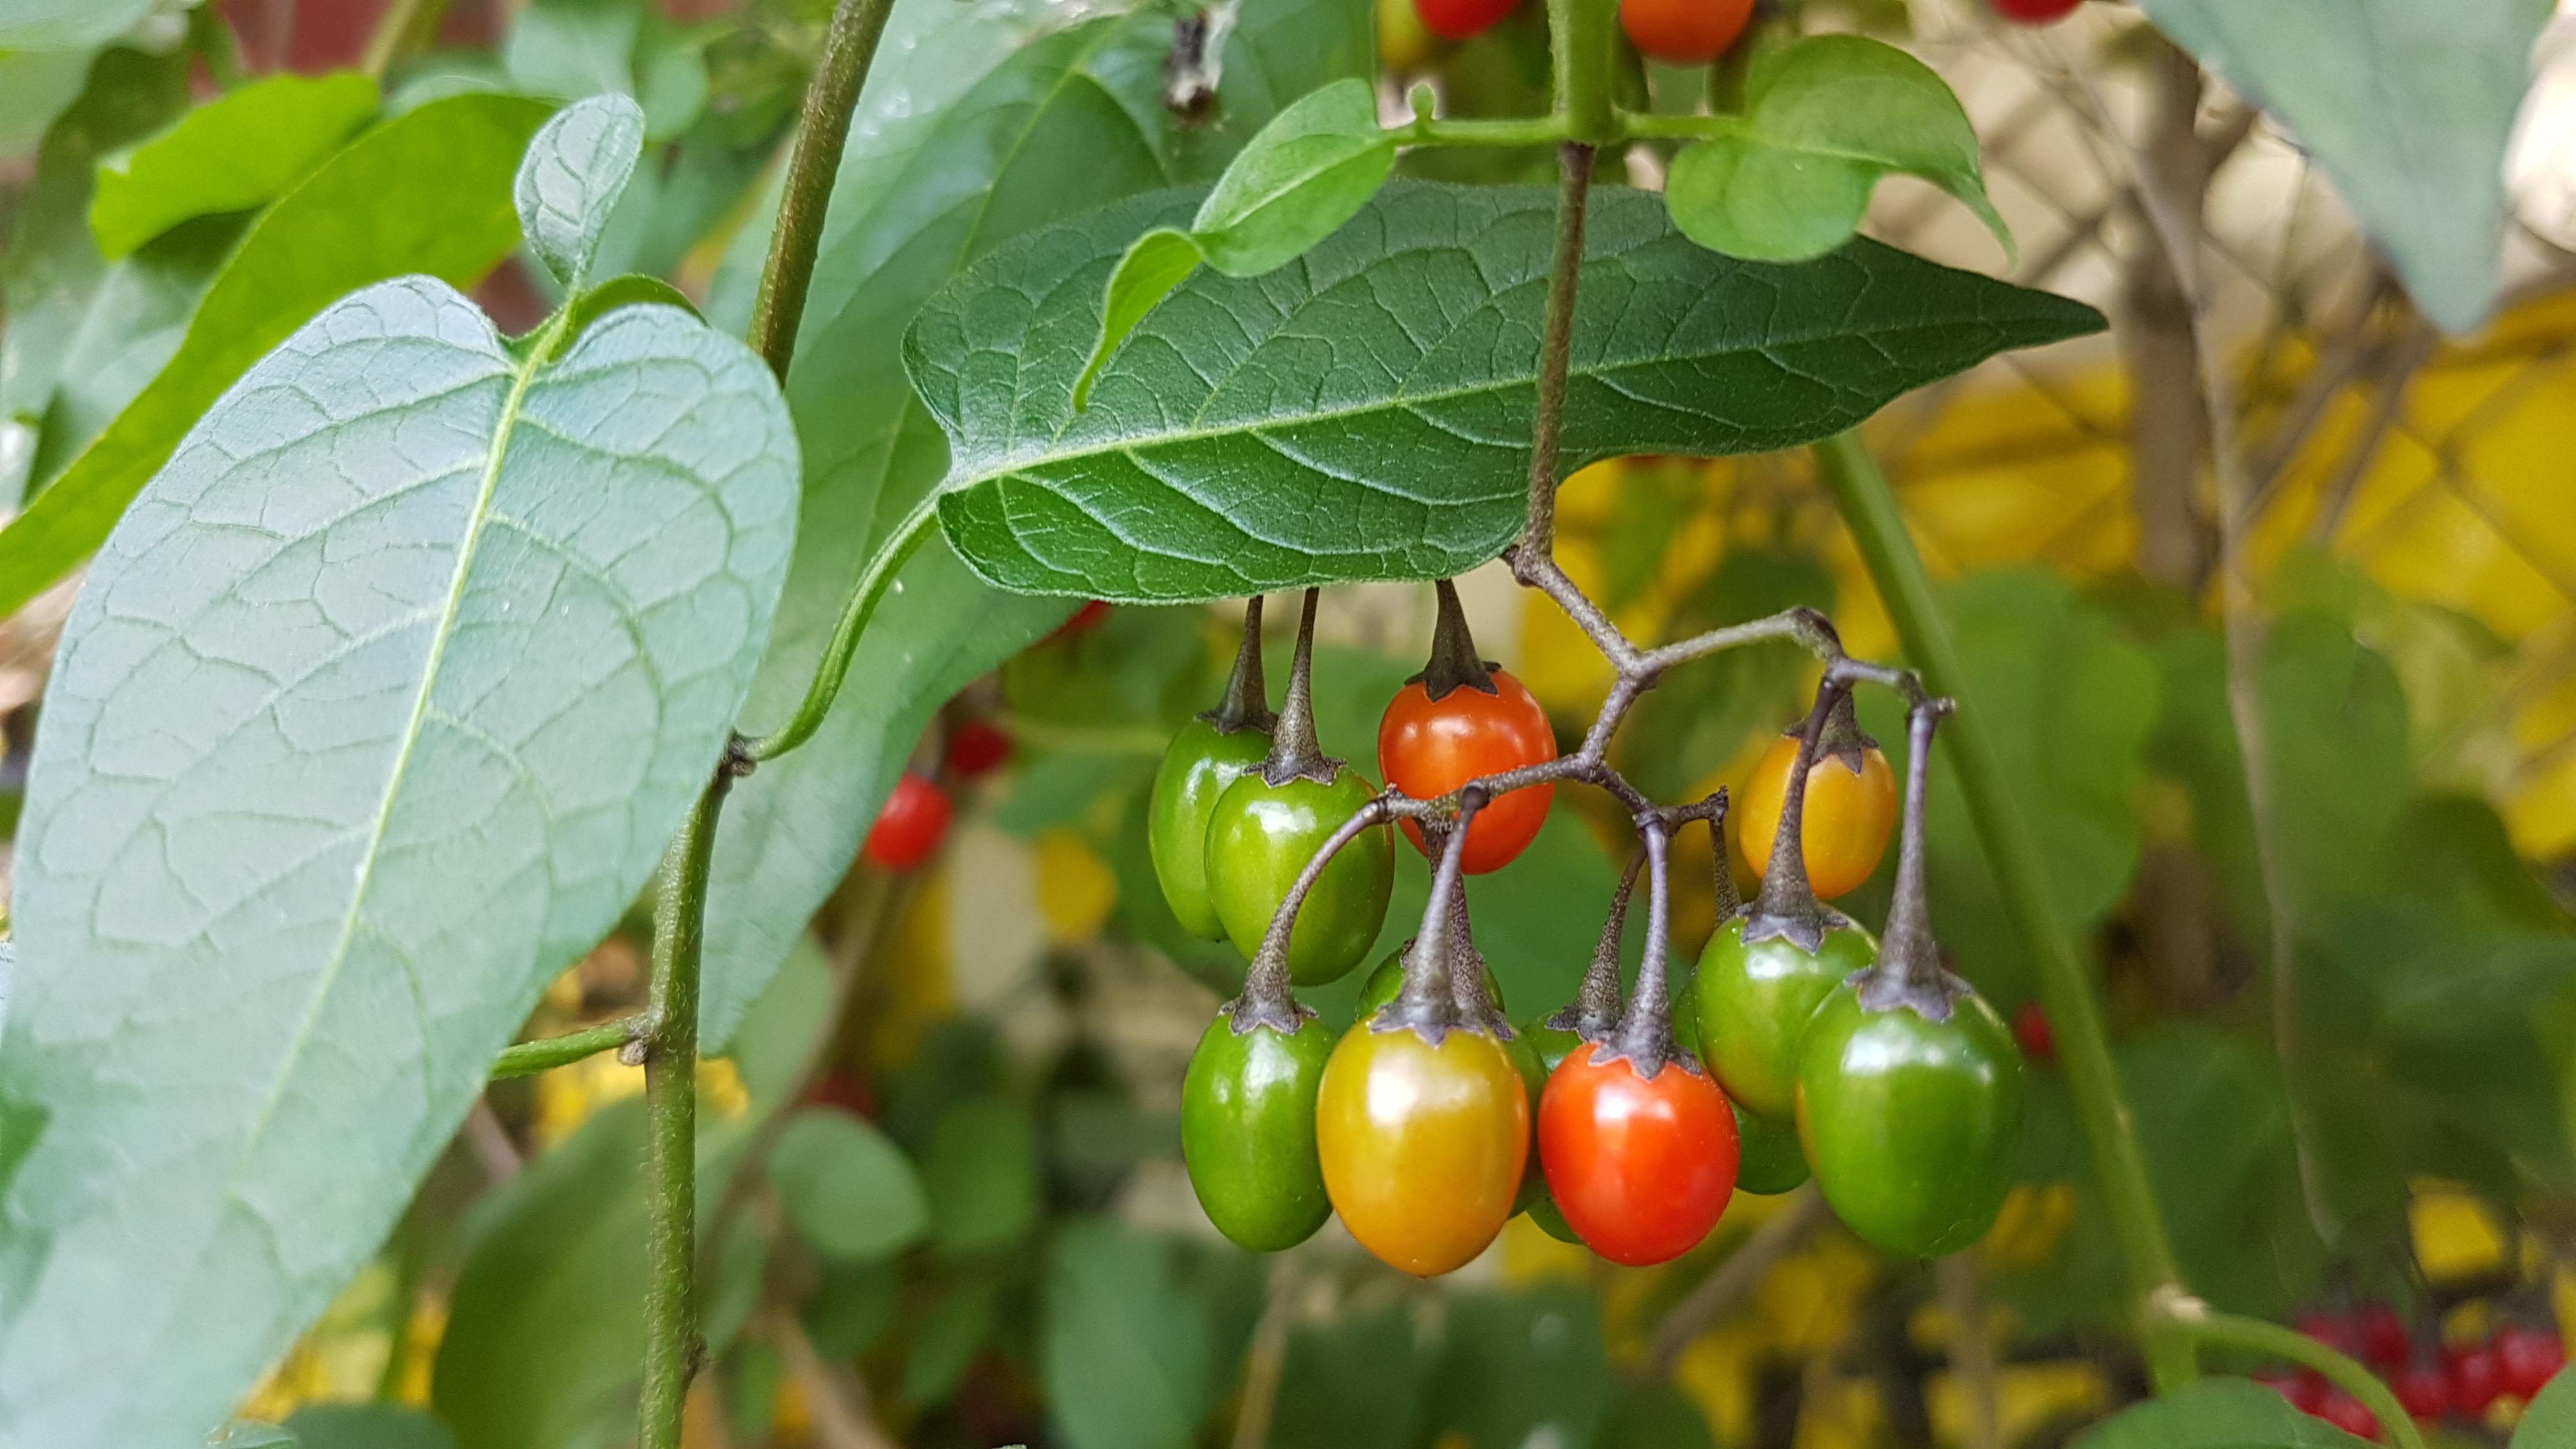 Dråpeformede bær i grønt, gult og rødt.